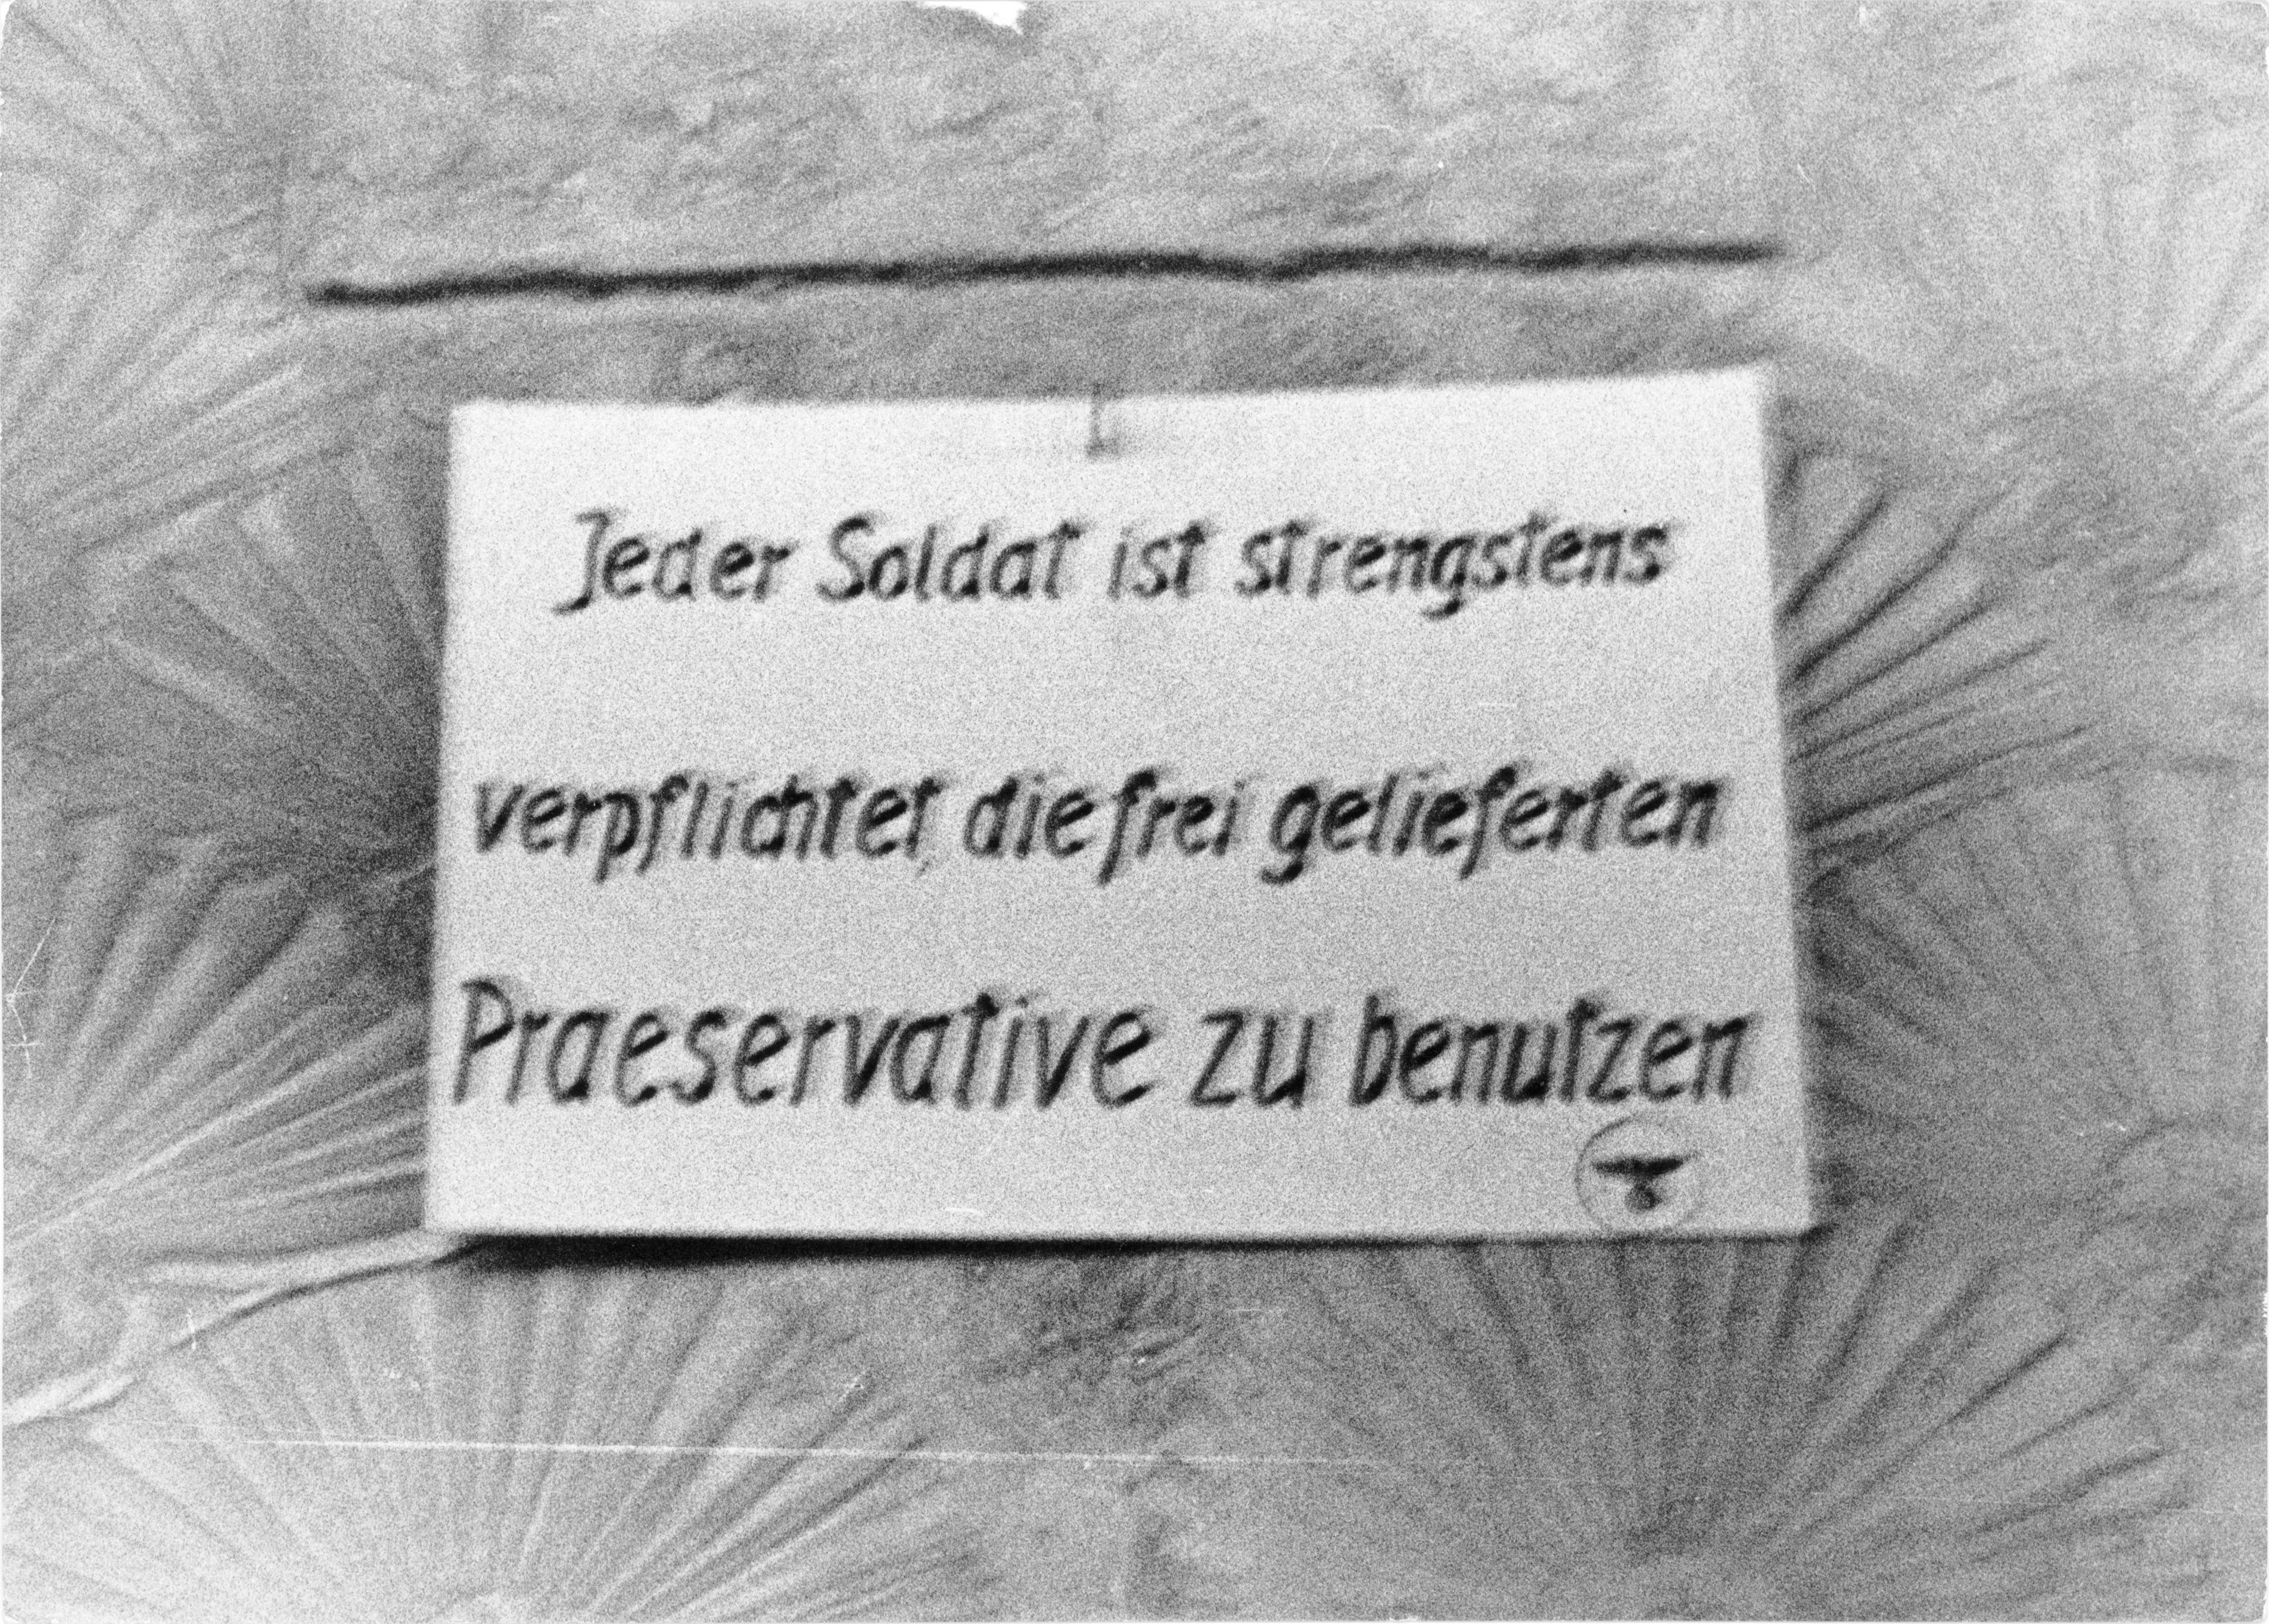 File:Bundesarchiv Bild 101II-MW-1019-10, Frankreich, Brest, Soldatenbordell.jpg